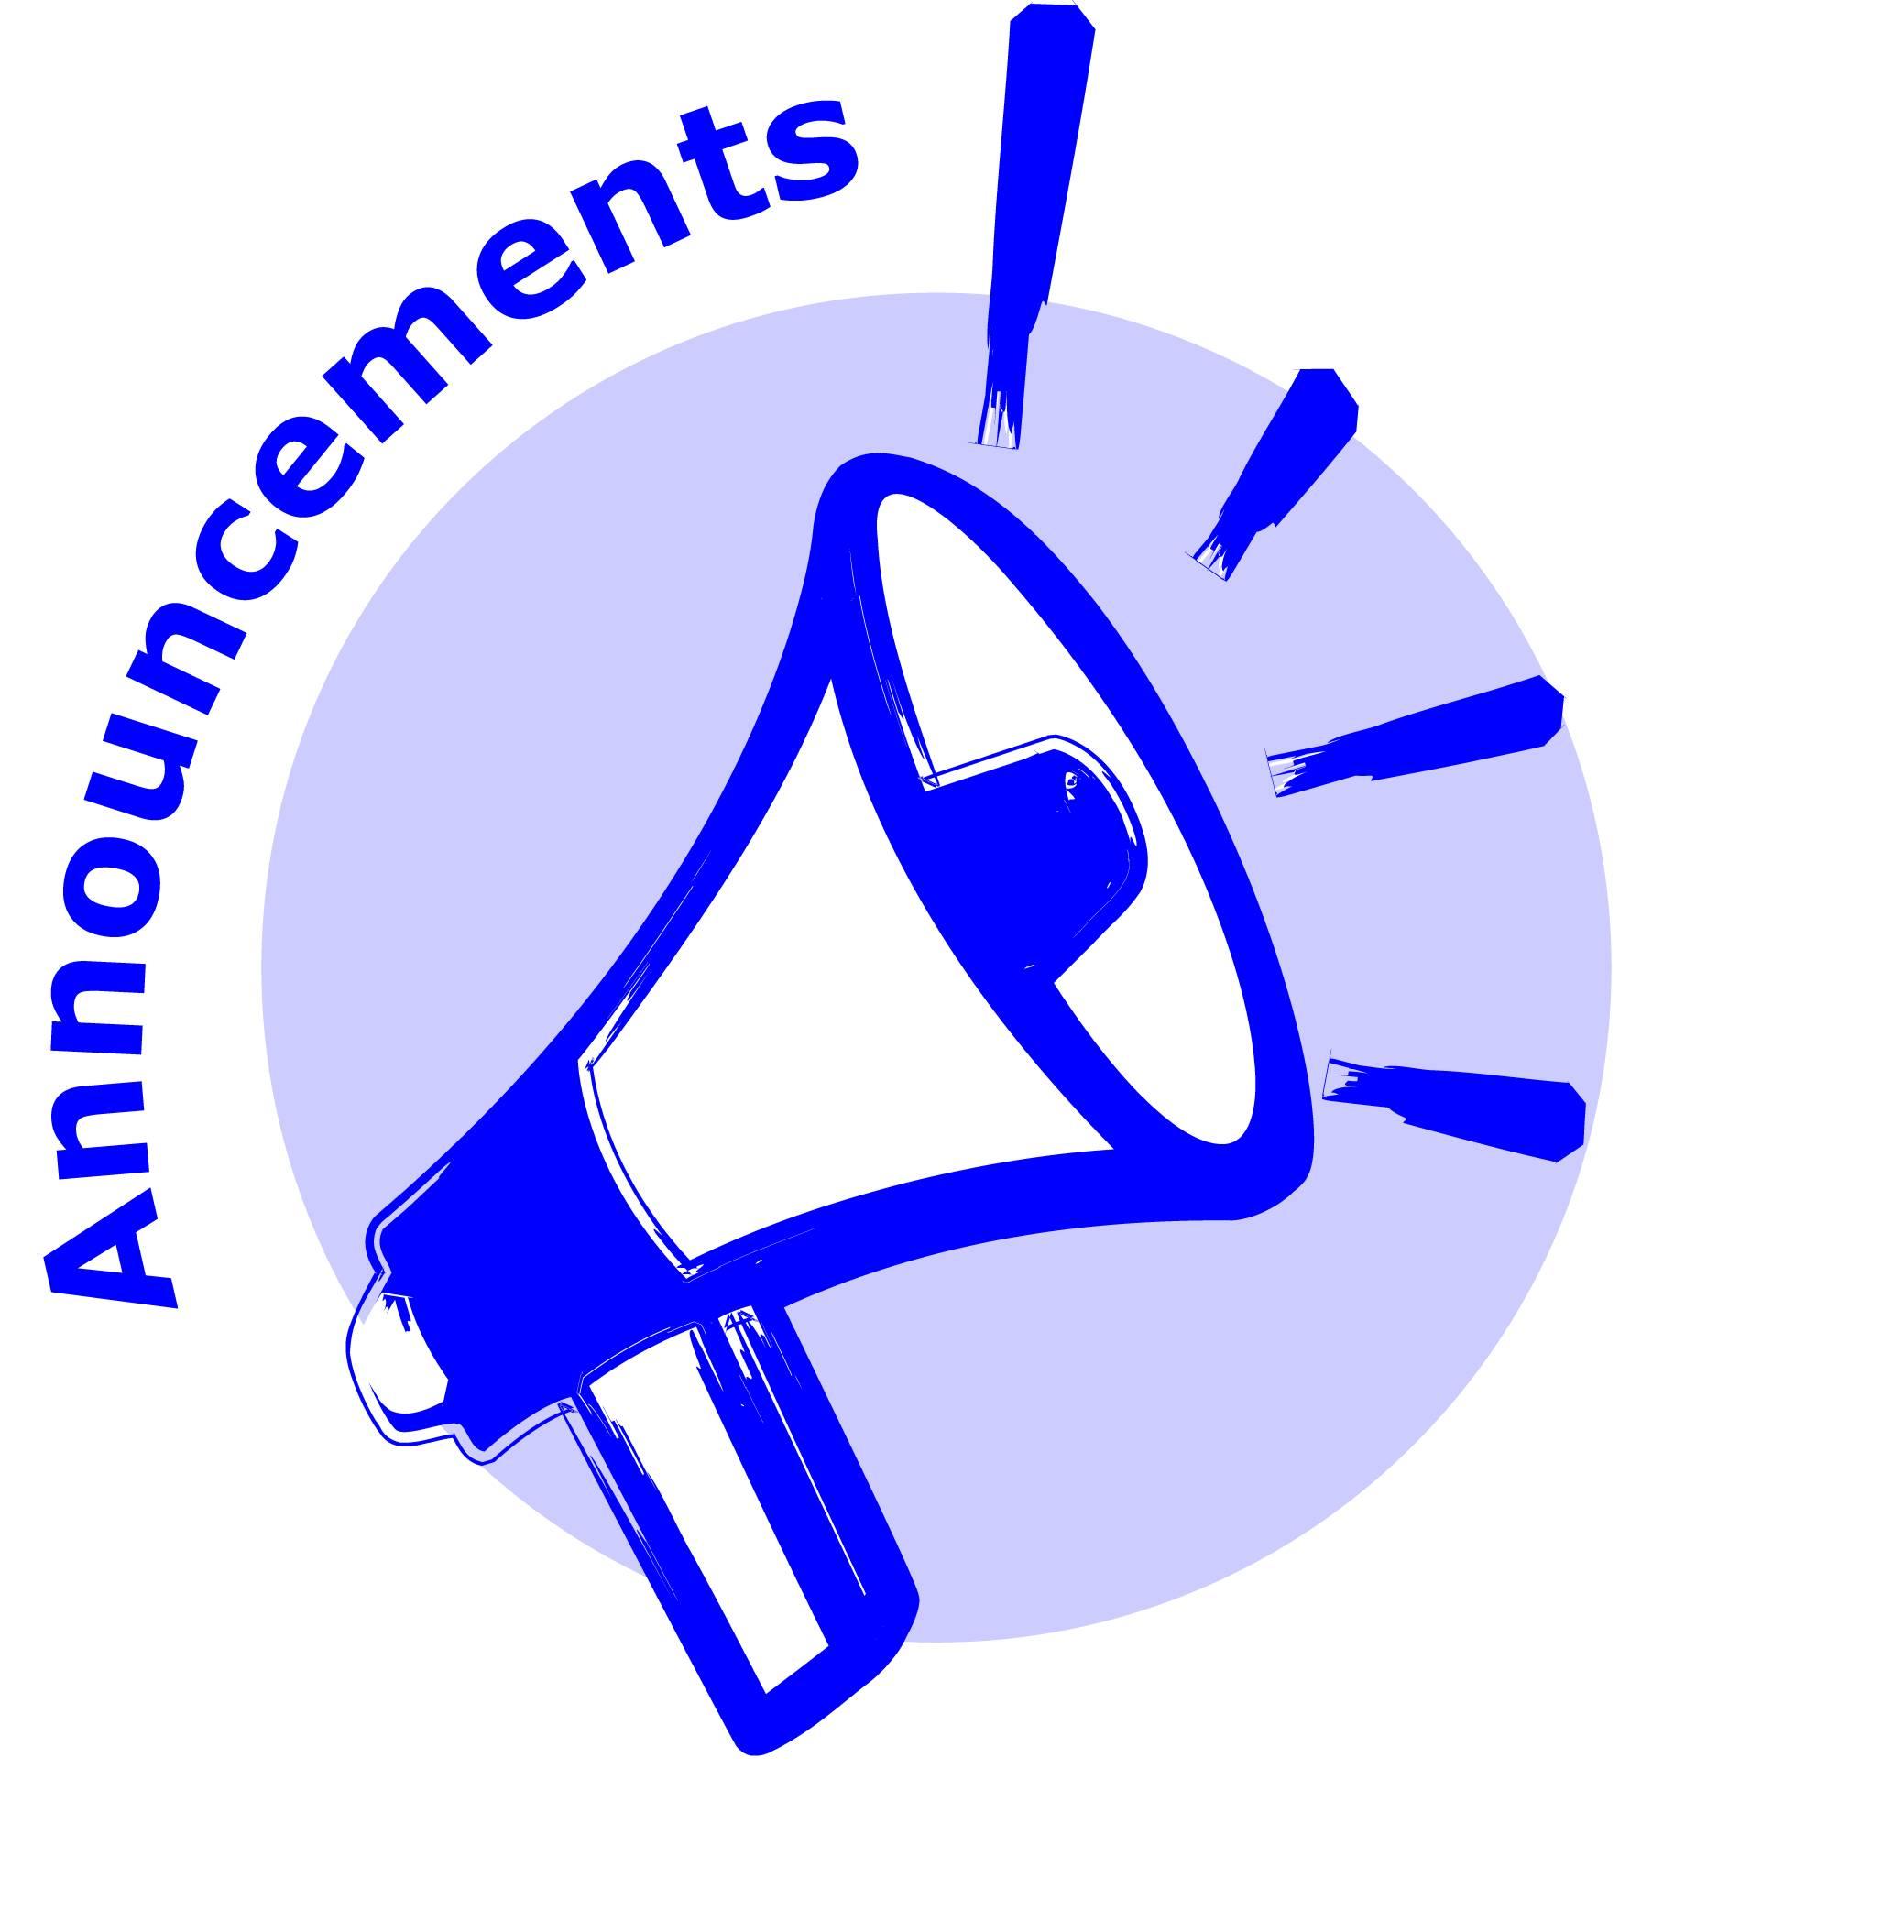 Announcement clipart team. Cilpart valuable inspiration outage